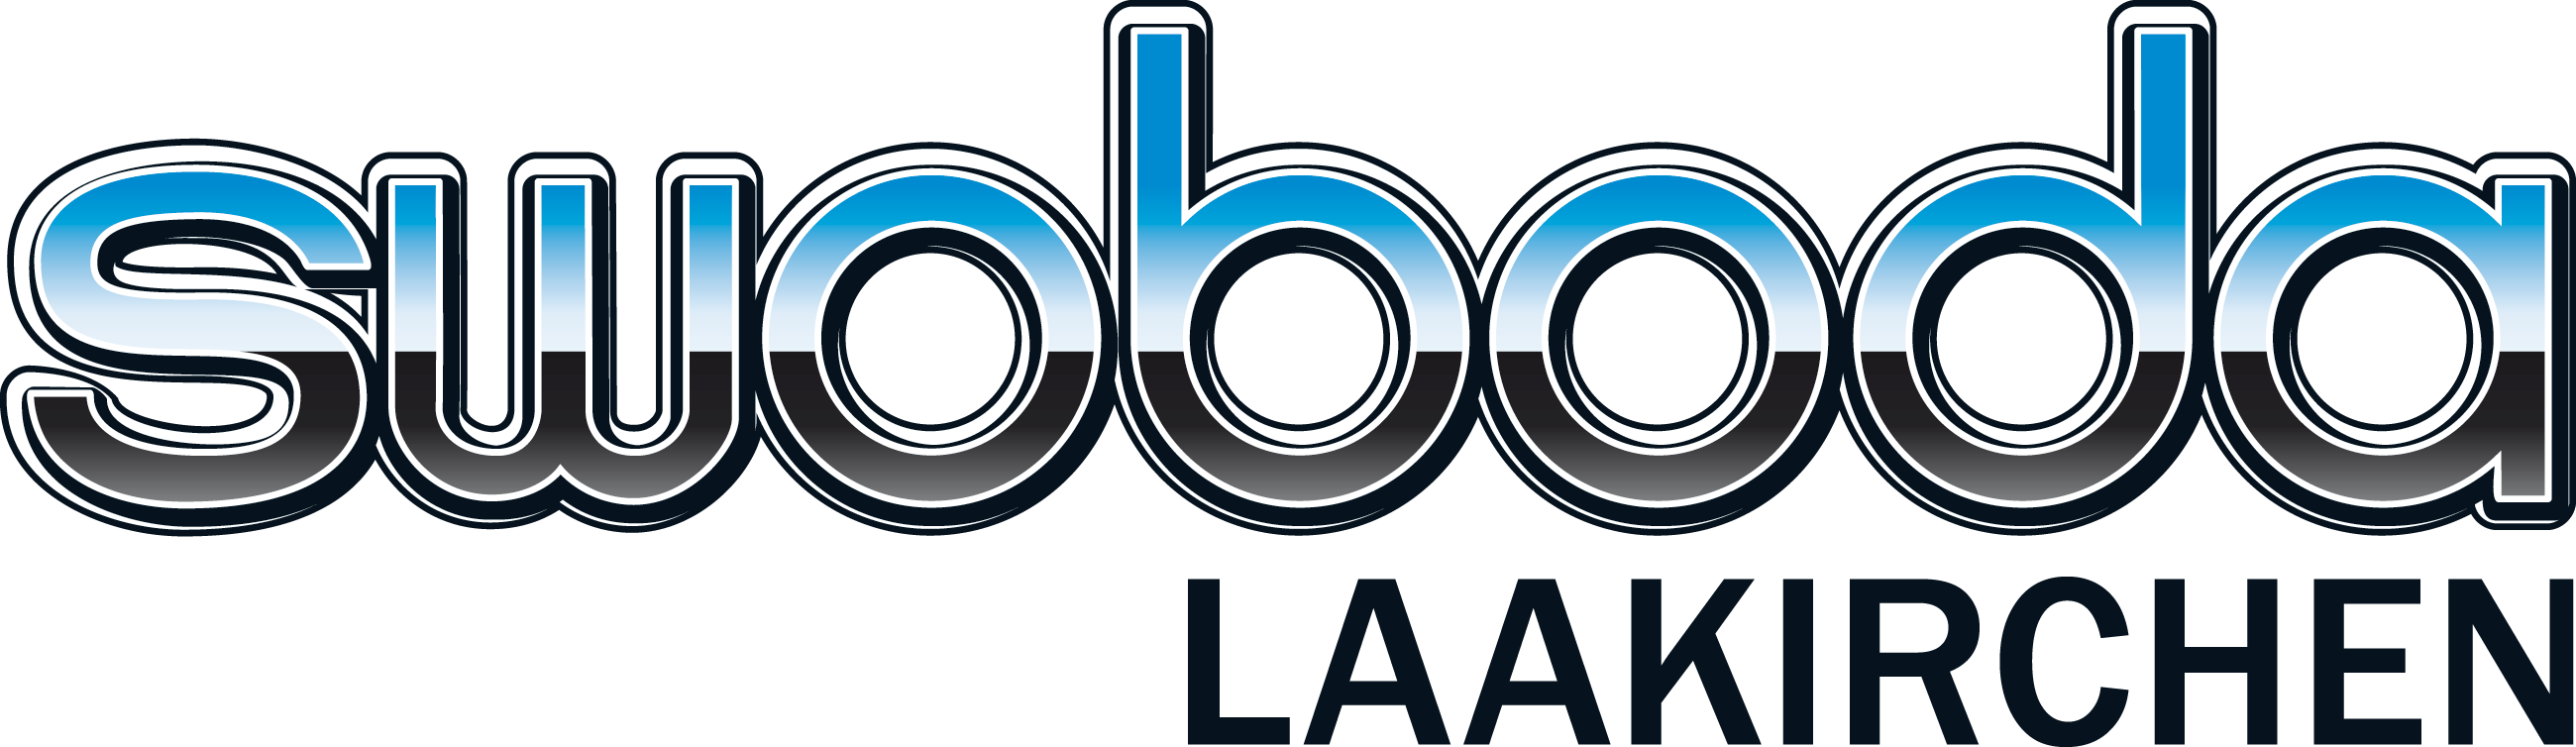 Logo Automobile Swoboda Ges.m.b.H. Laakirchen